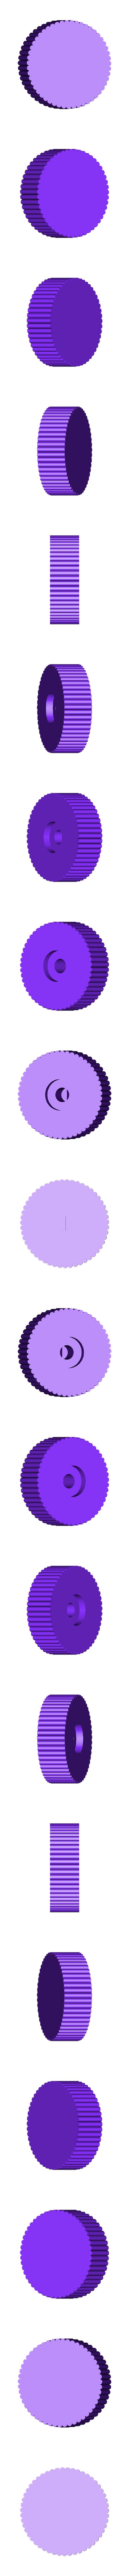 Potentiometer_knob.stl Download free STL file JUUKE - RFID Music Player • 3D printable design, Ananords